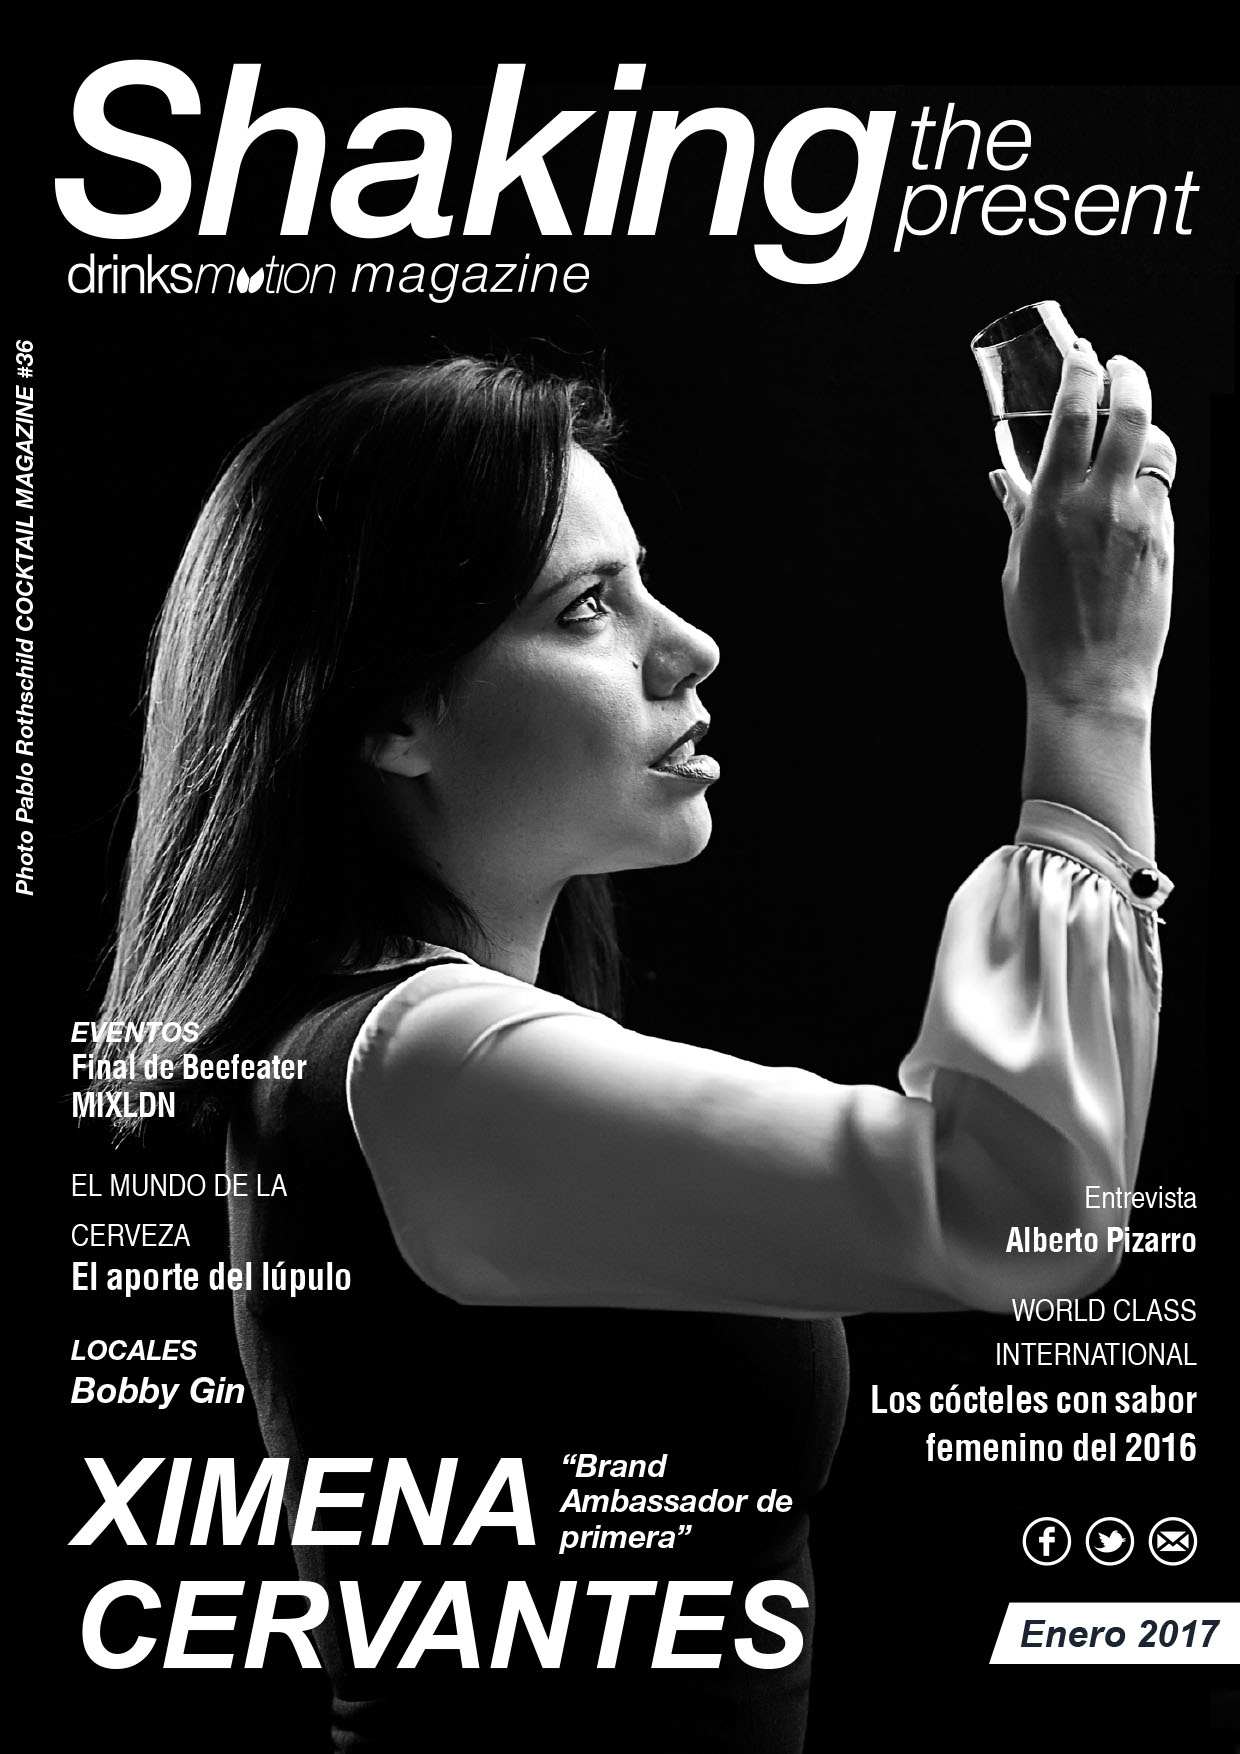 Magazine #36 Enero 2017 – Ximena Cervantes